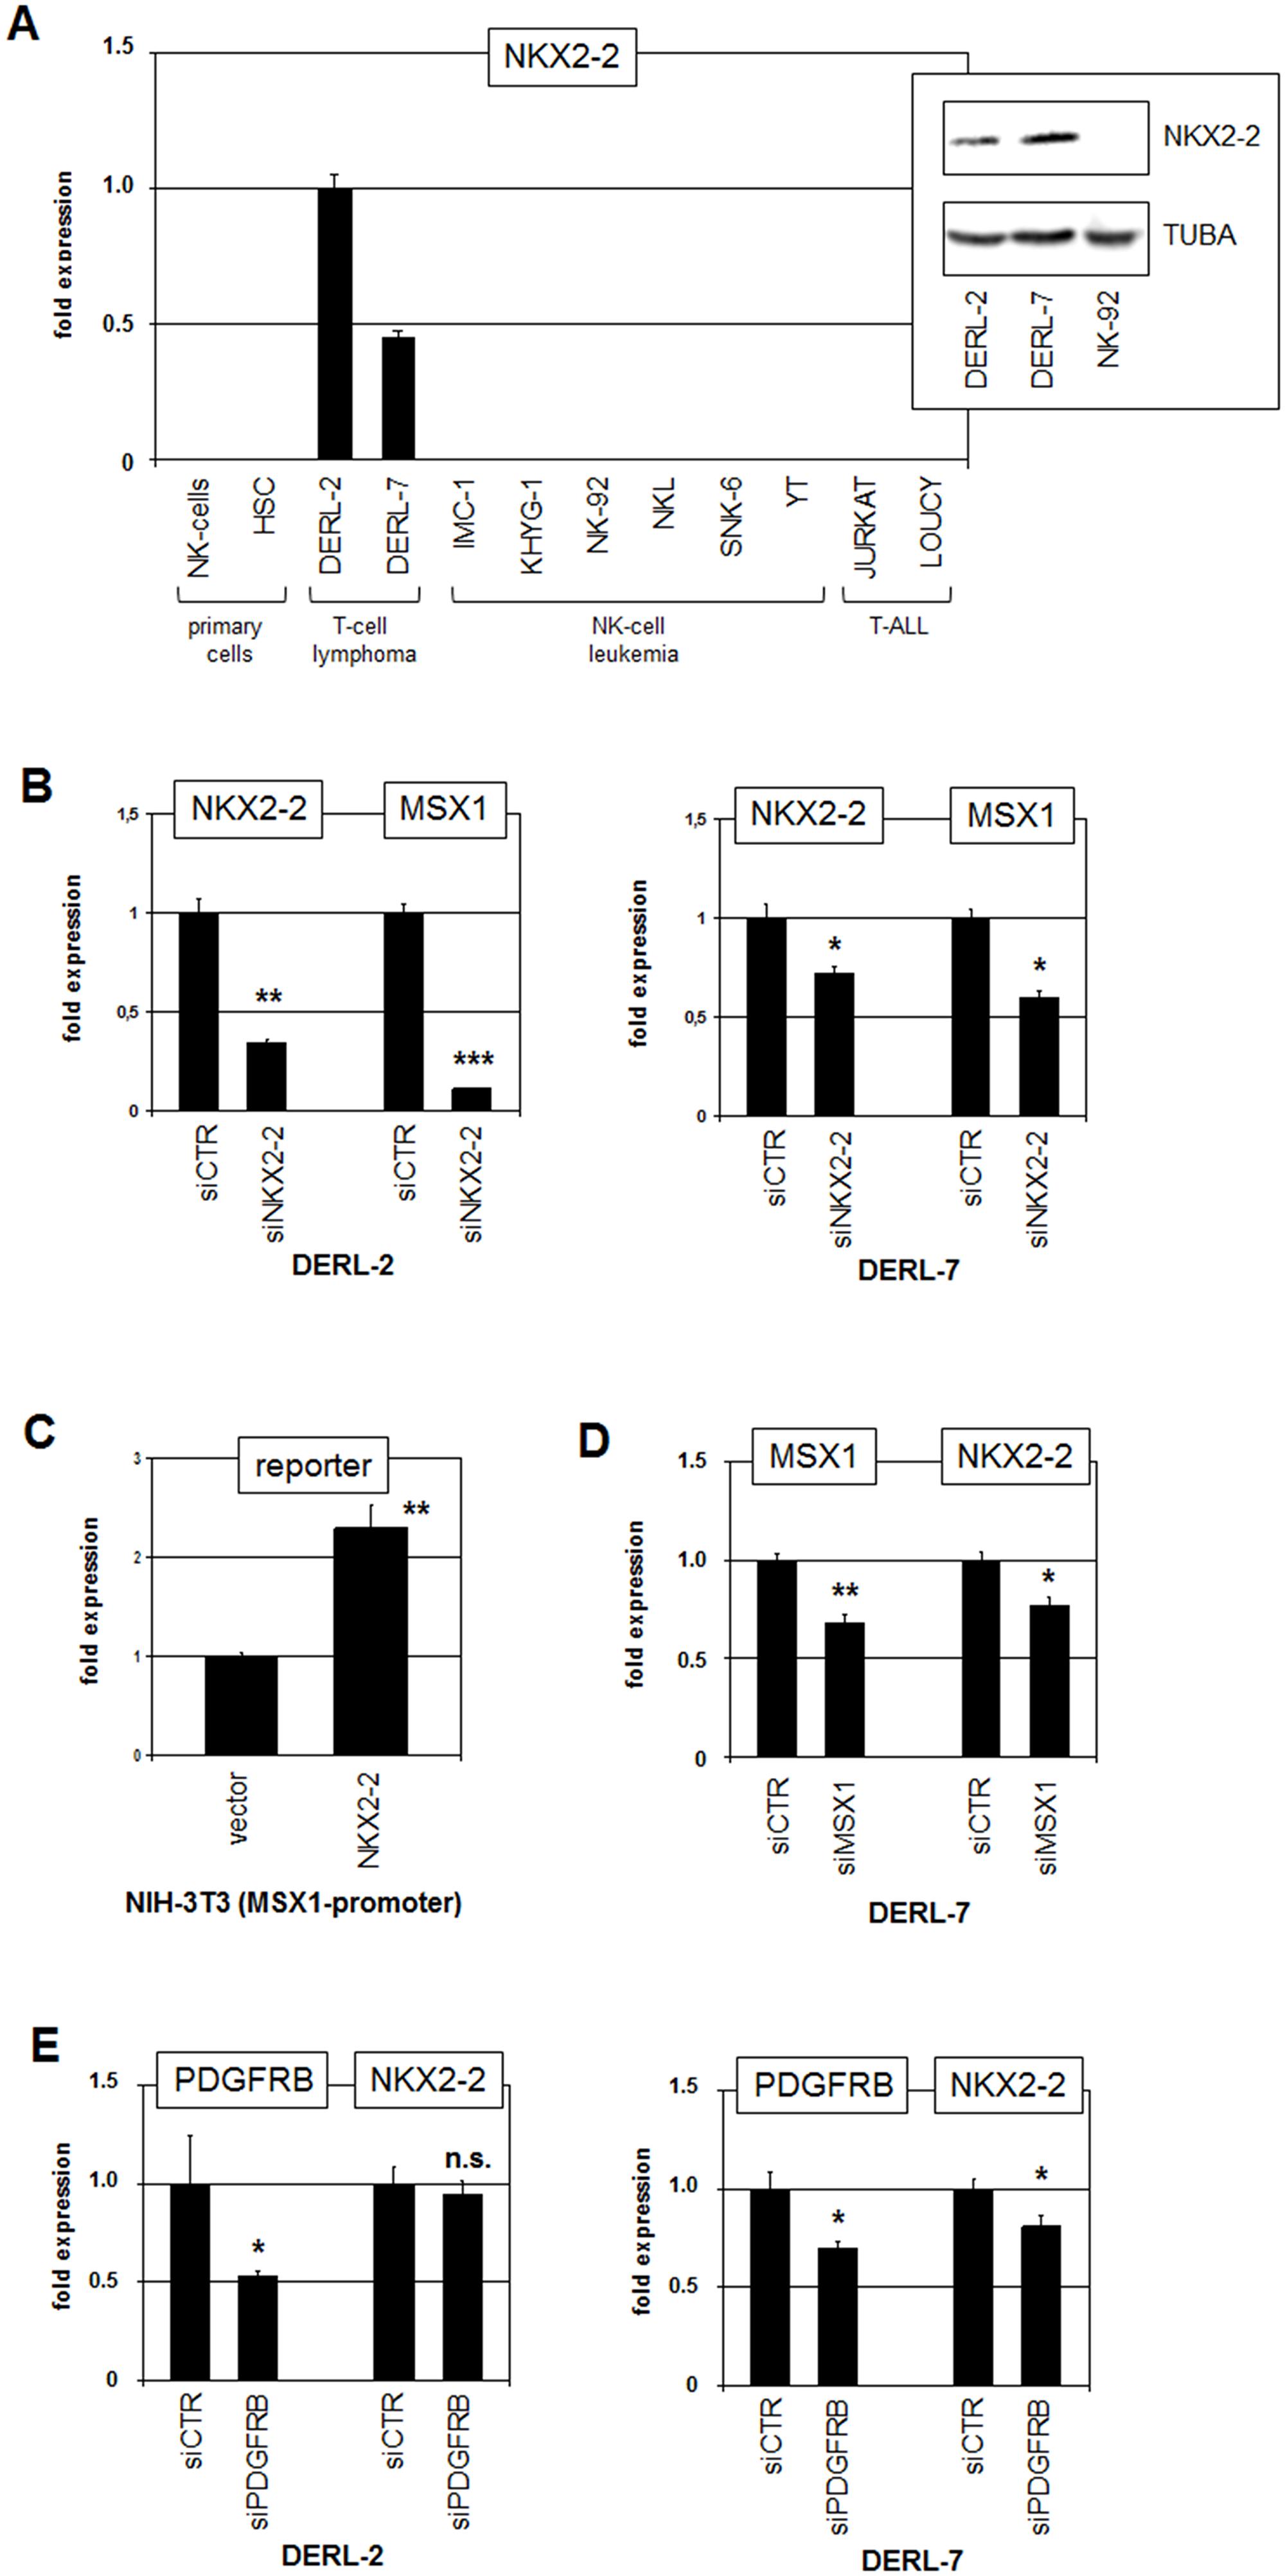 Analysis of NKX2-2.